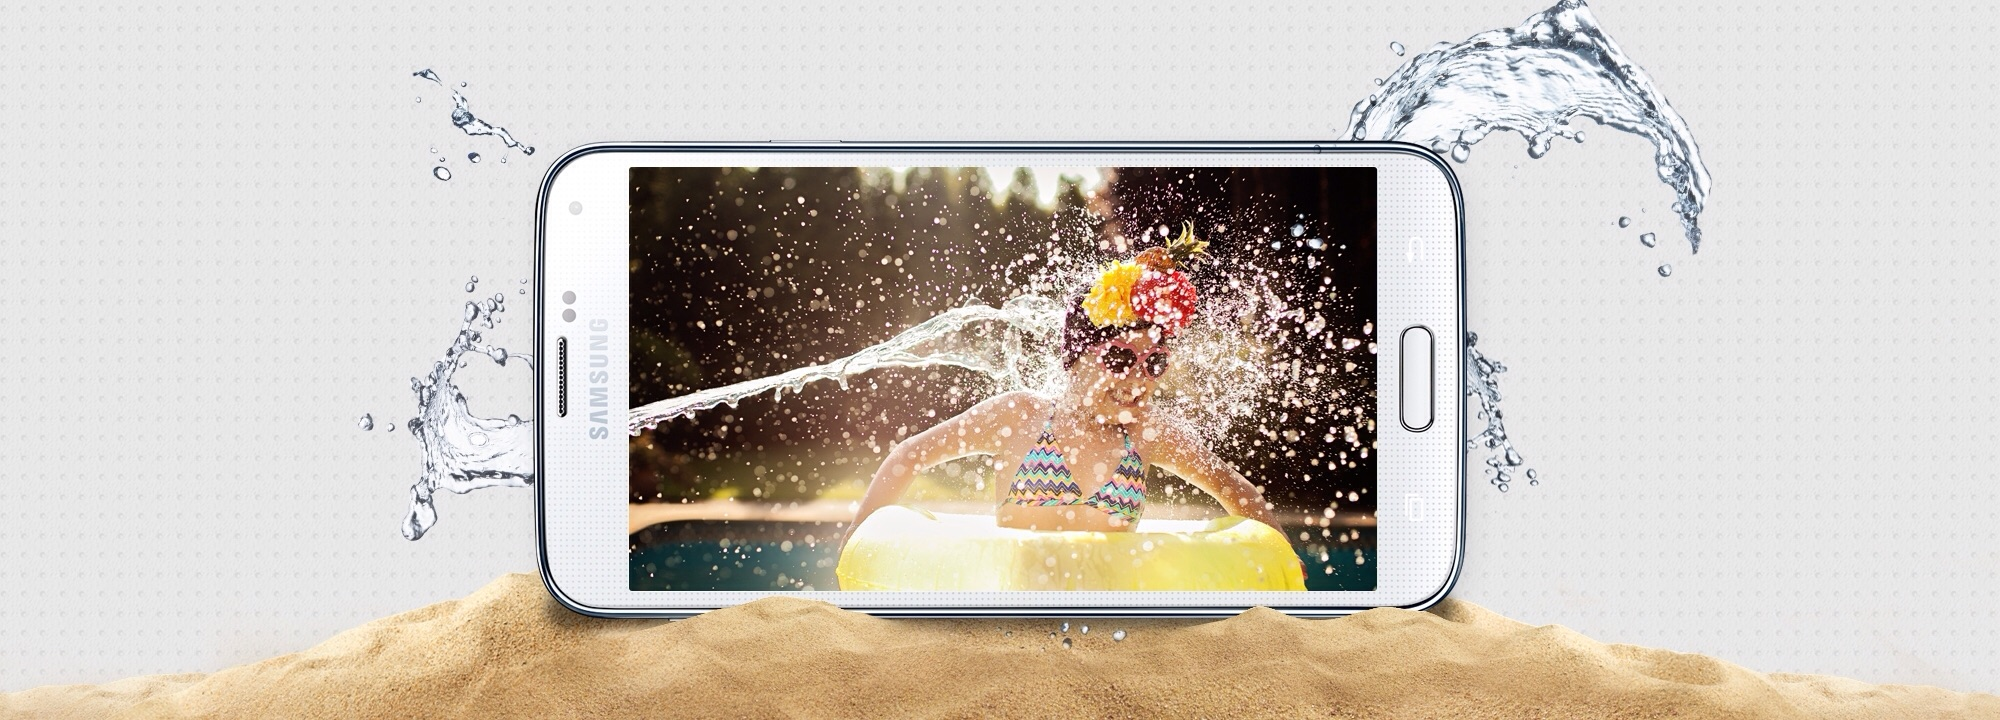 Samsung Galaxy S5 - TelOneiPhone.fr